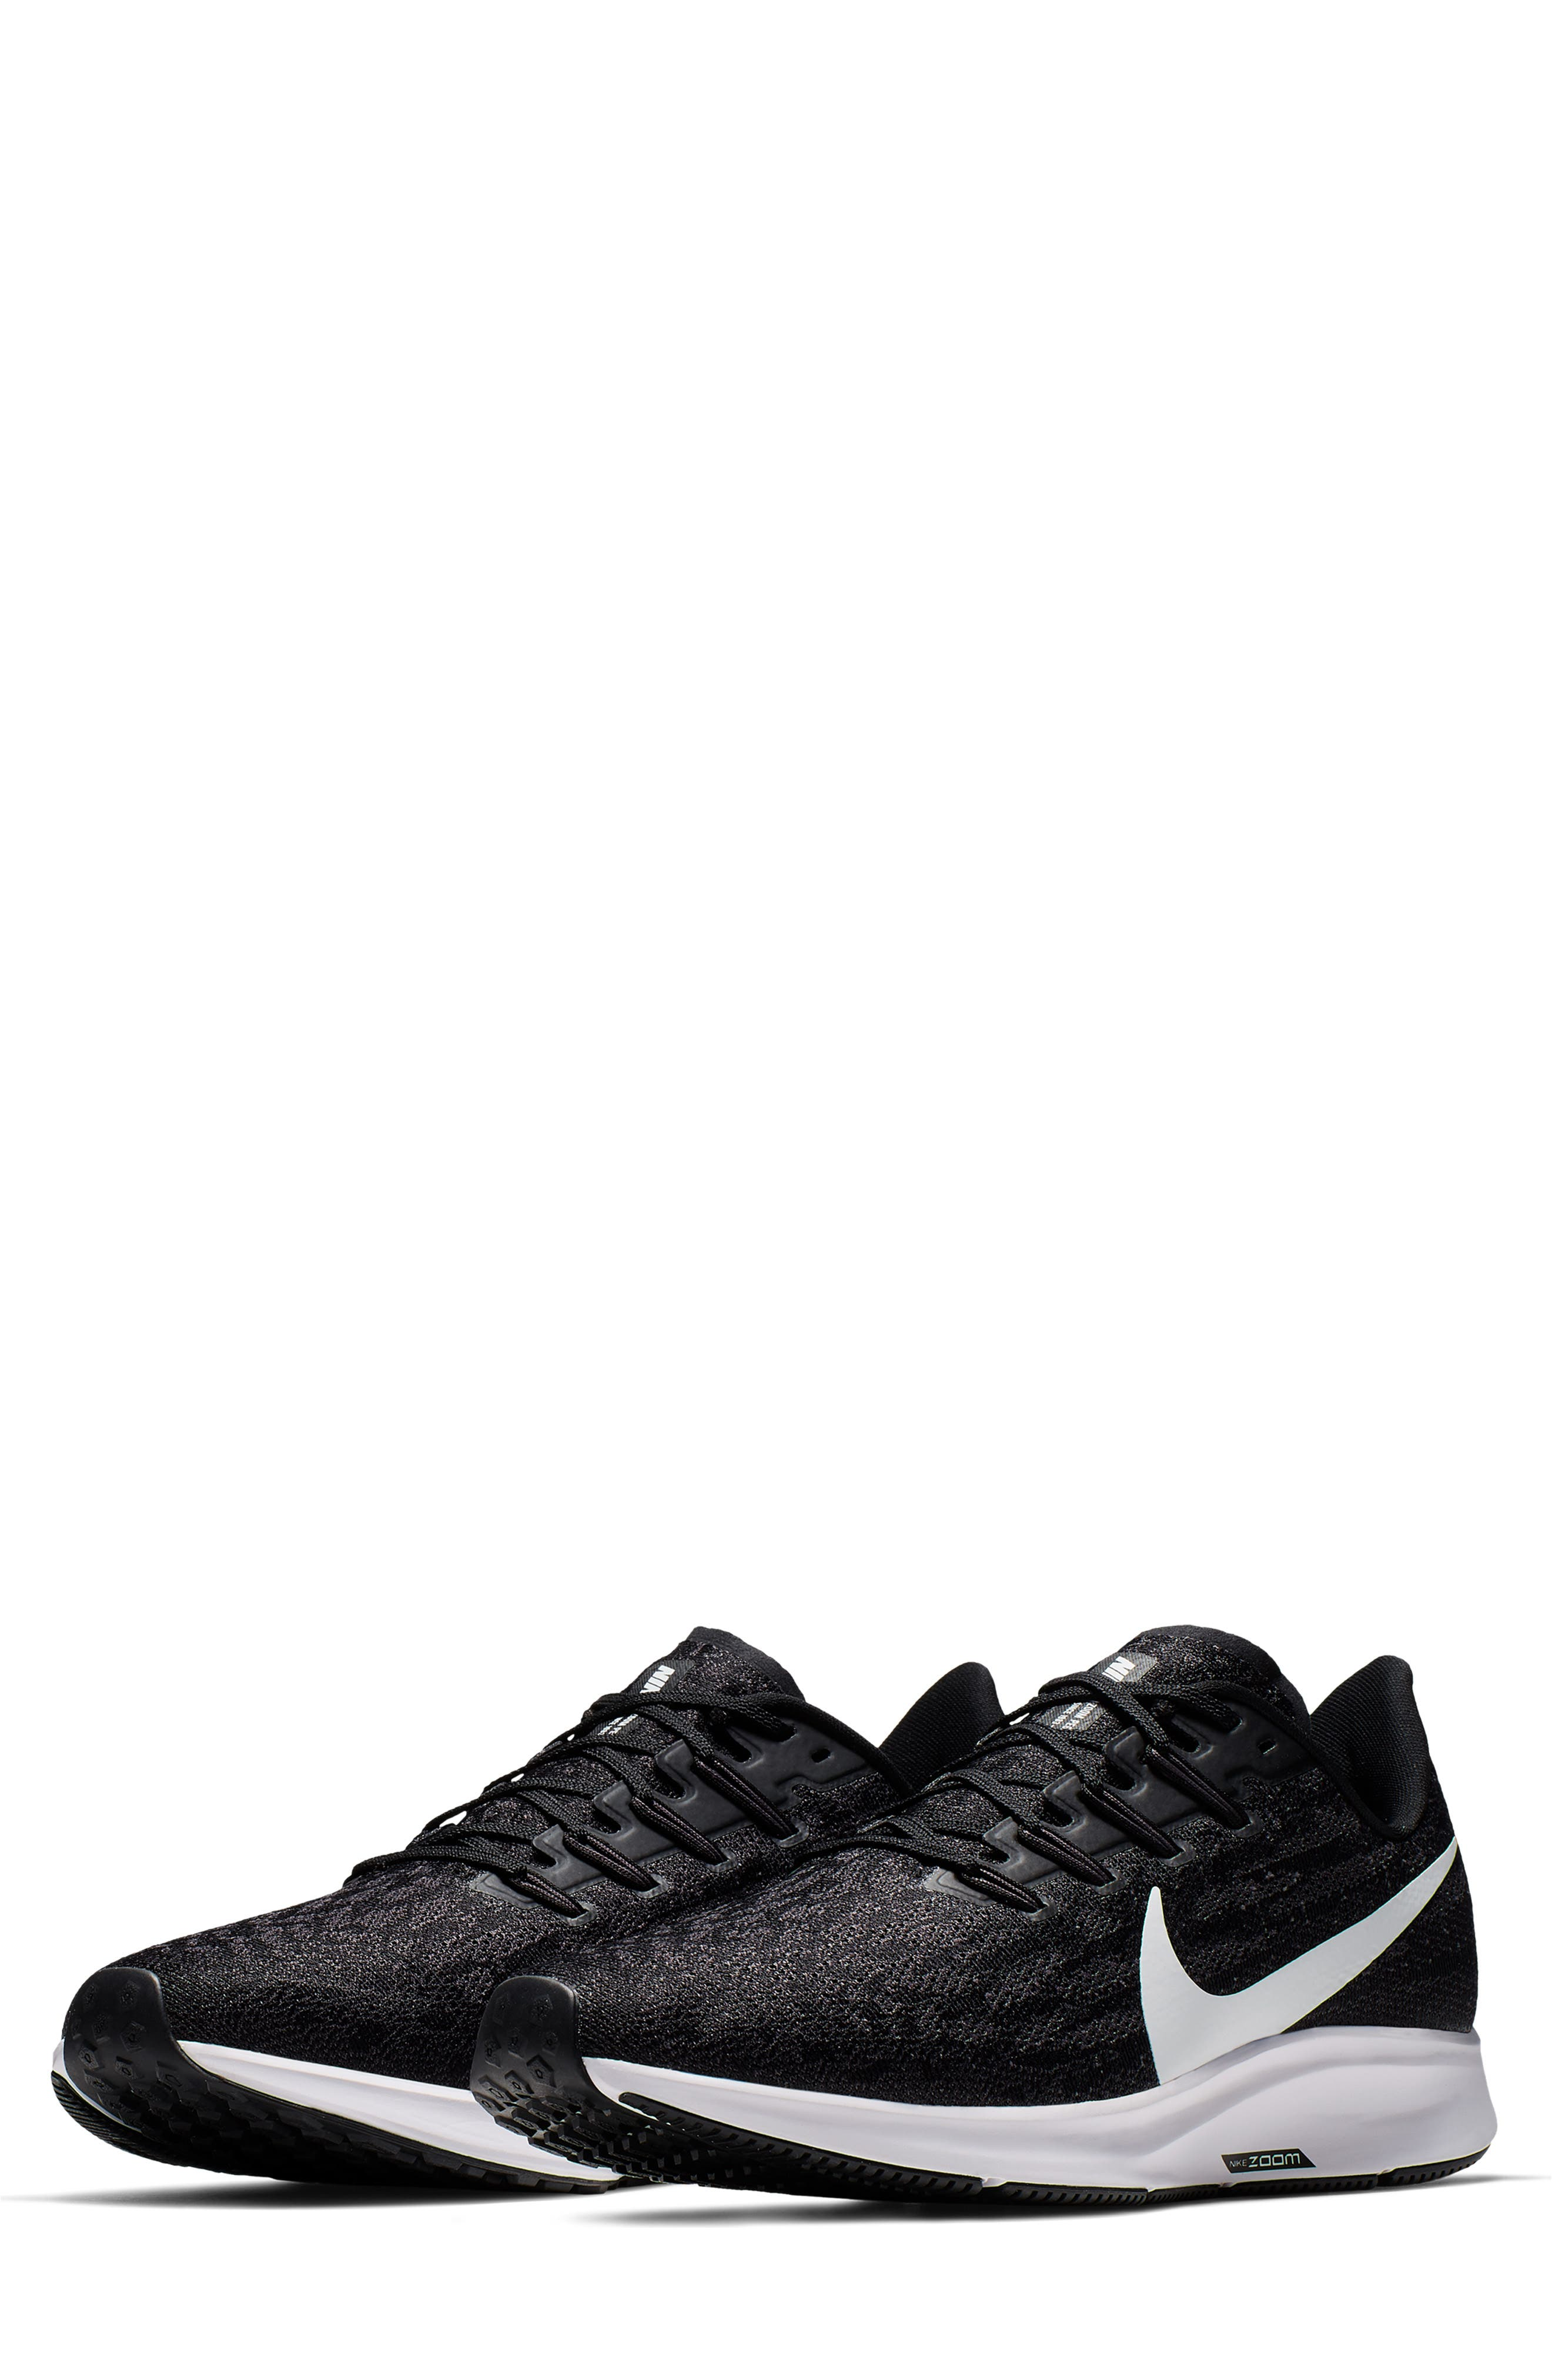 da84133791 Men's Nike Air Zoom Pegasus 36 Running Shoe, Size 8.5 D - Black